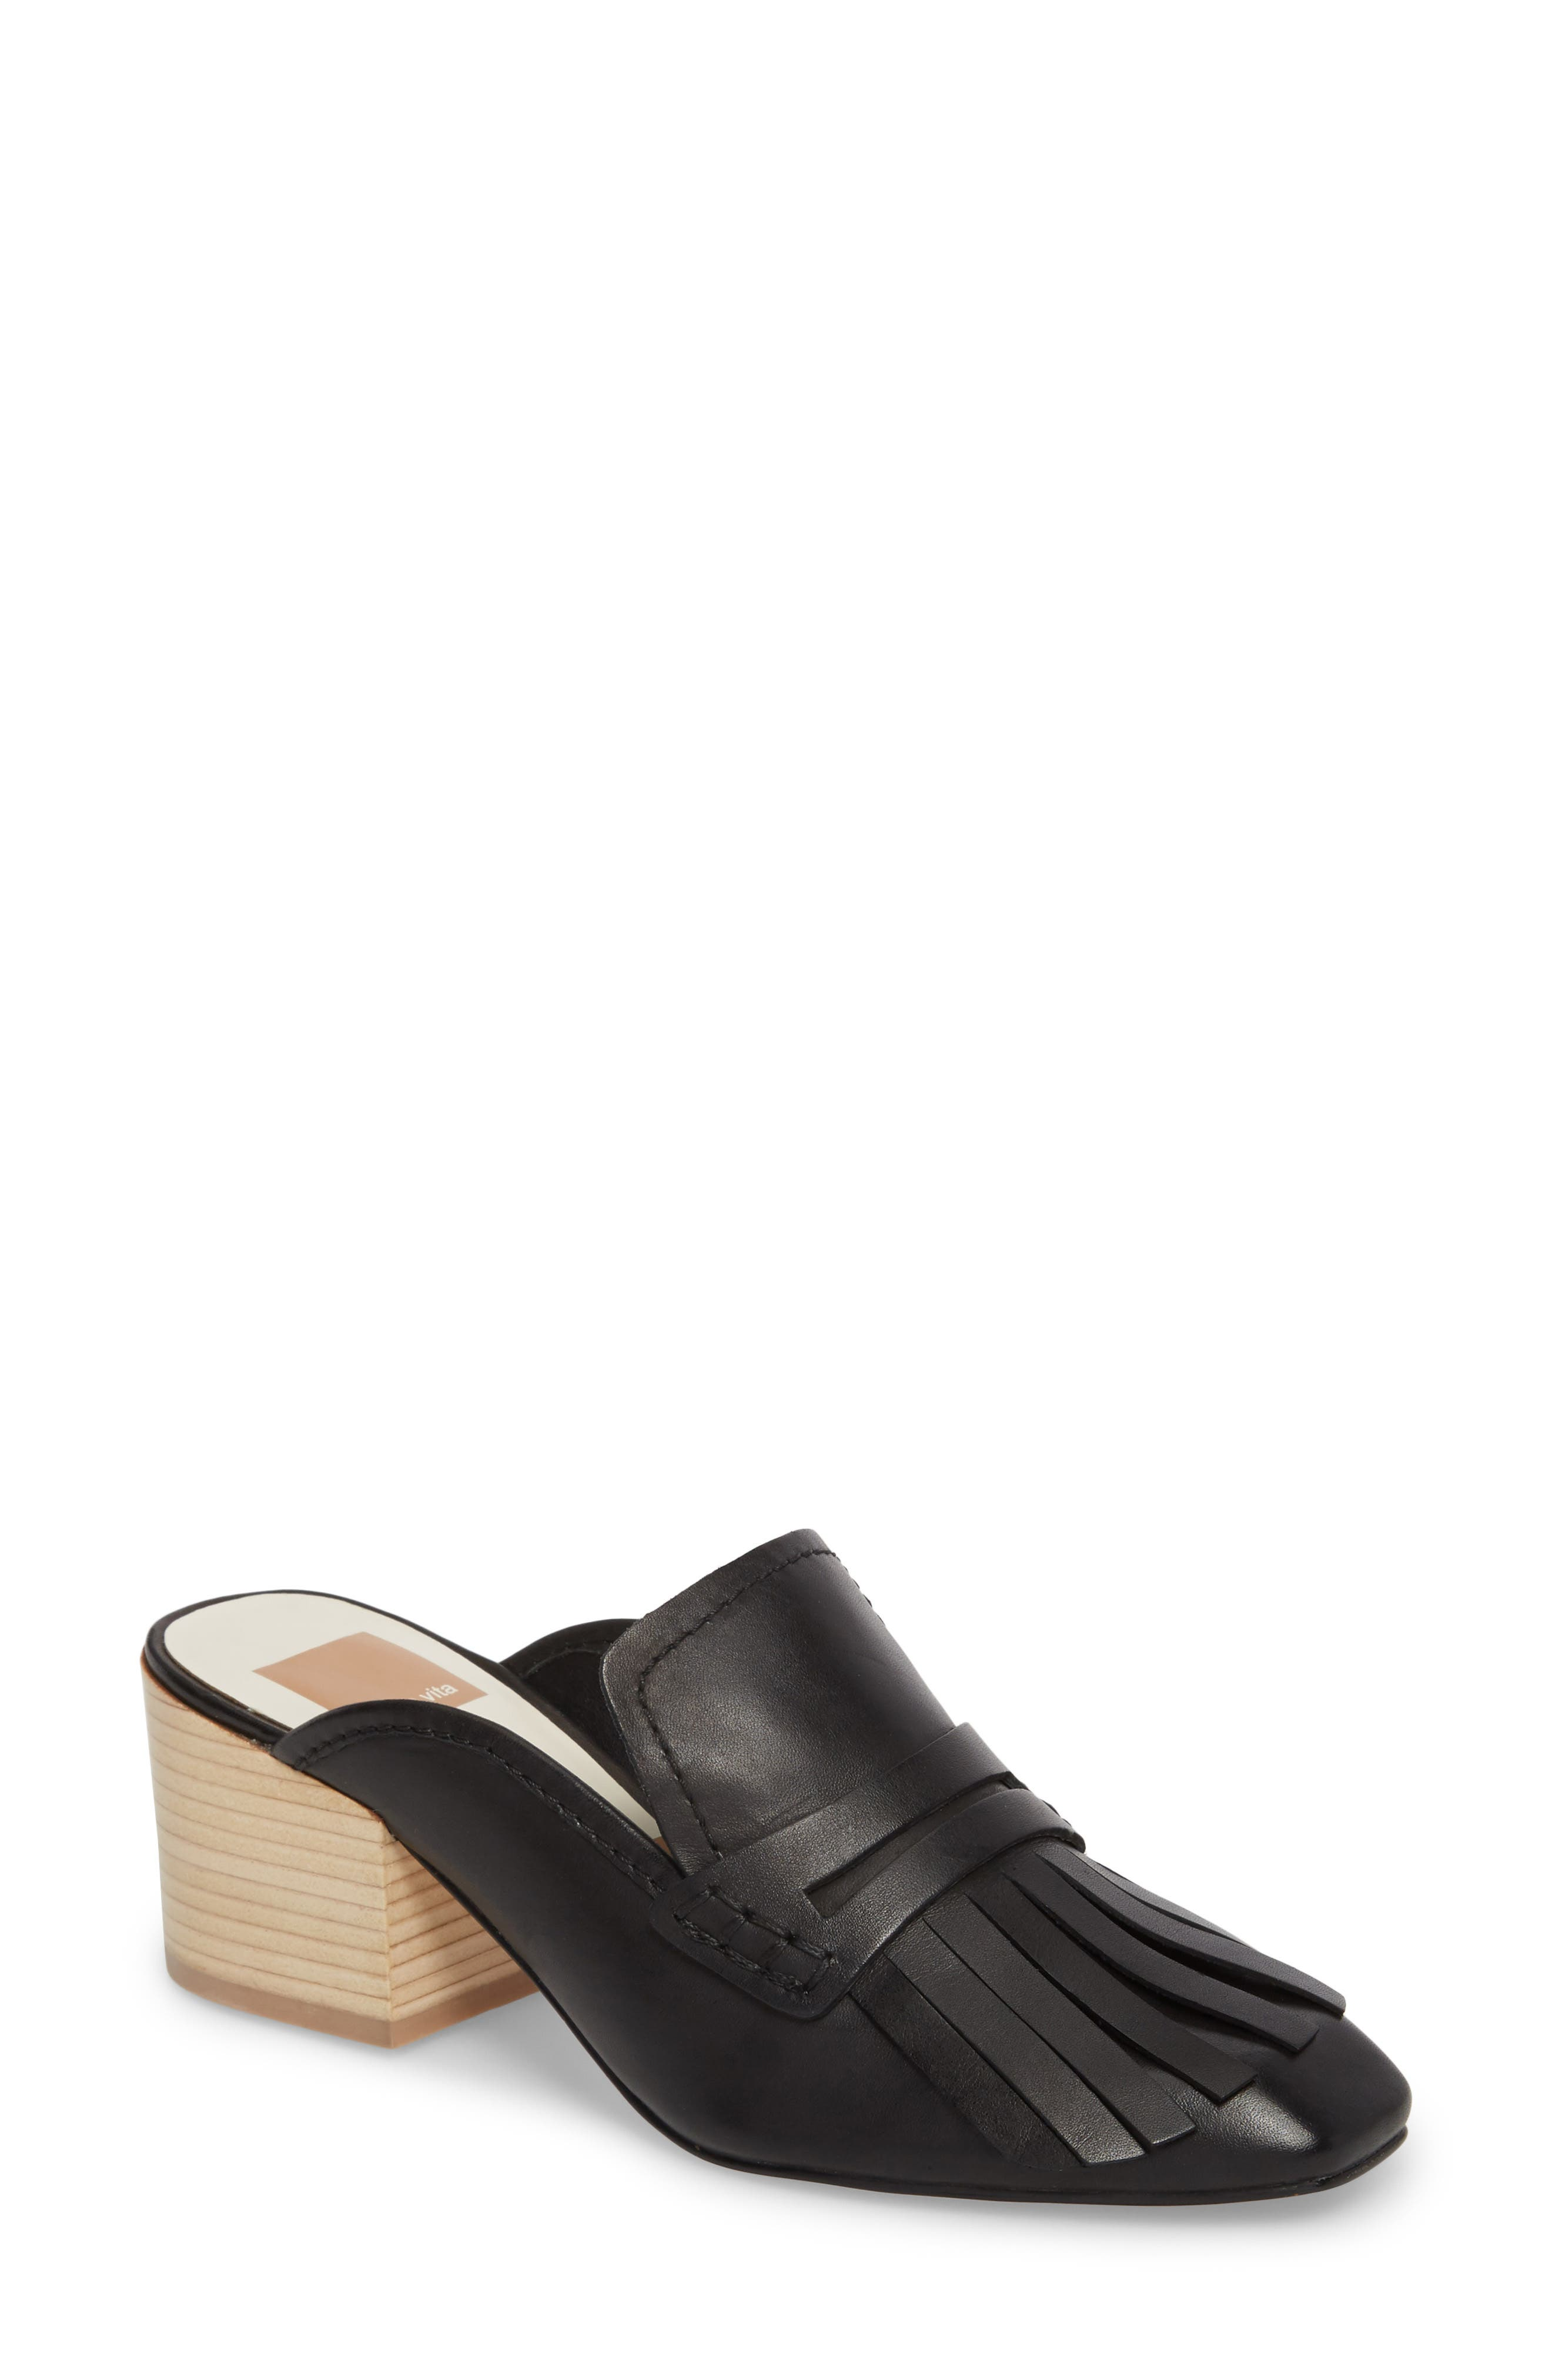 Katina Mule,                         Main,                         color, Black Leather